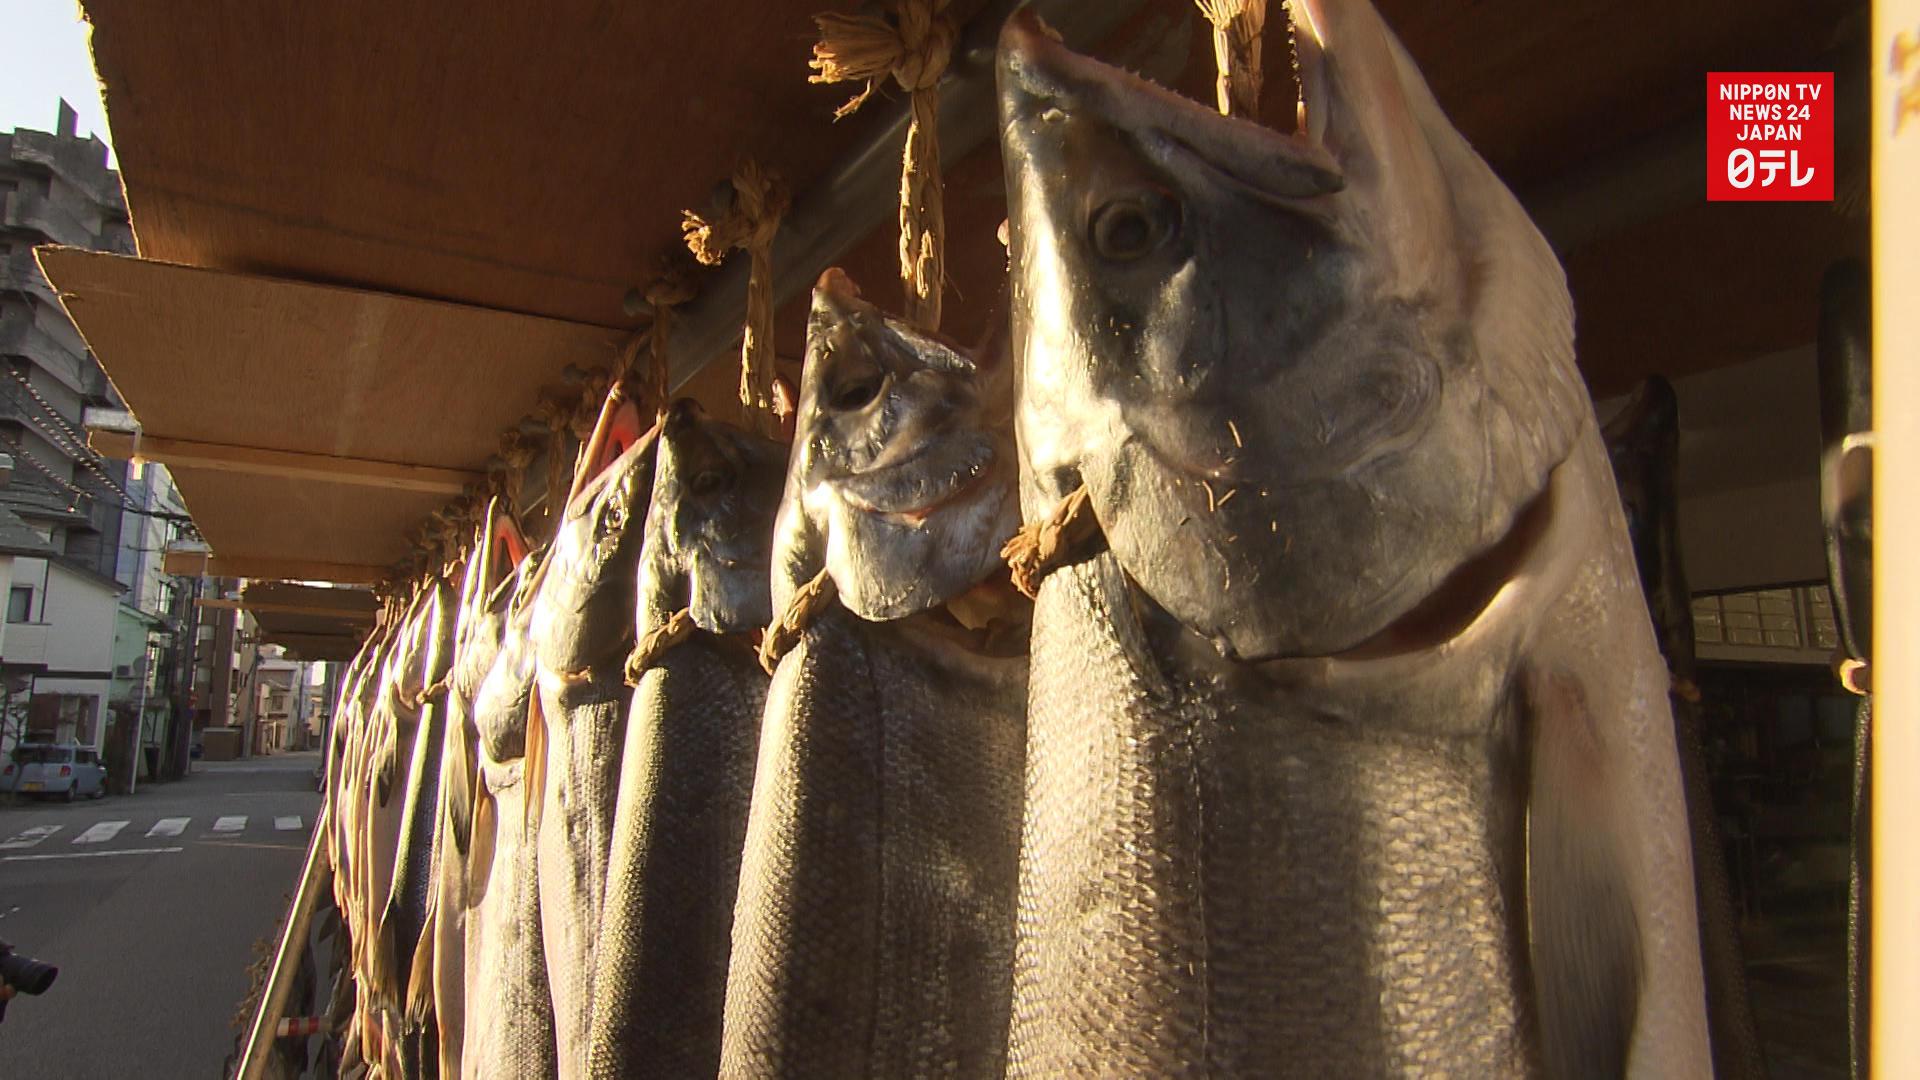 Sun-dried salmon